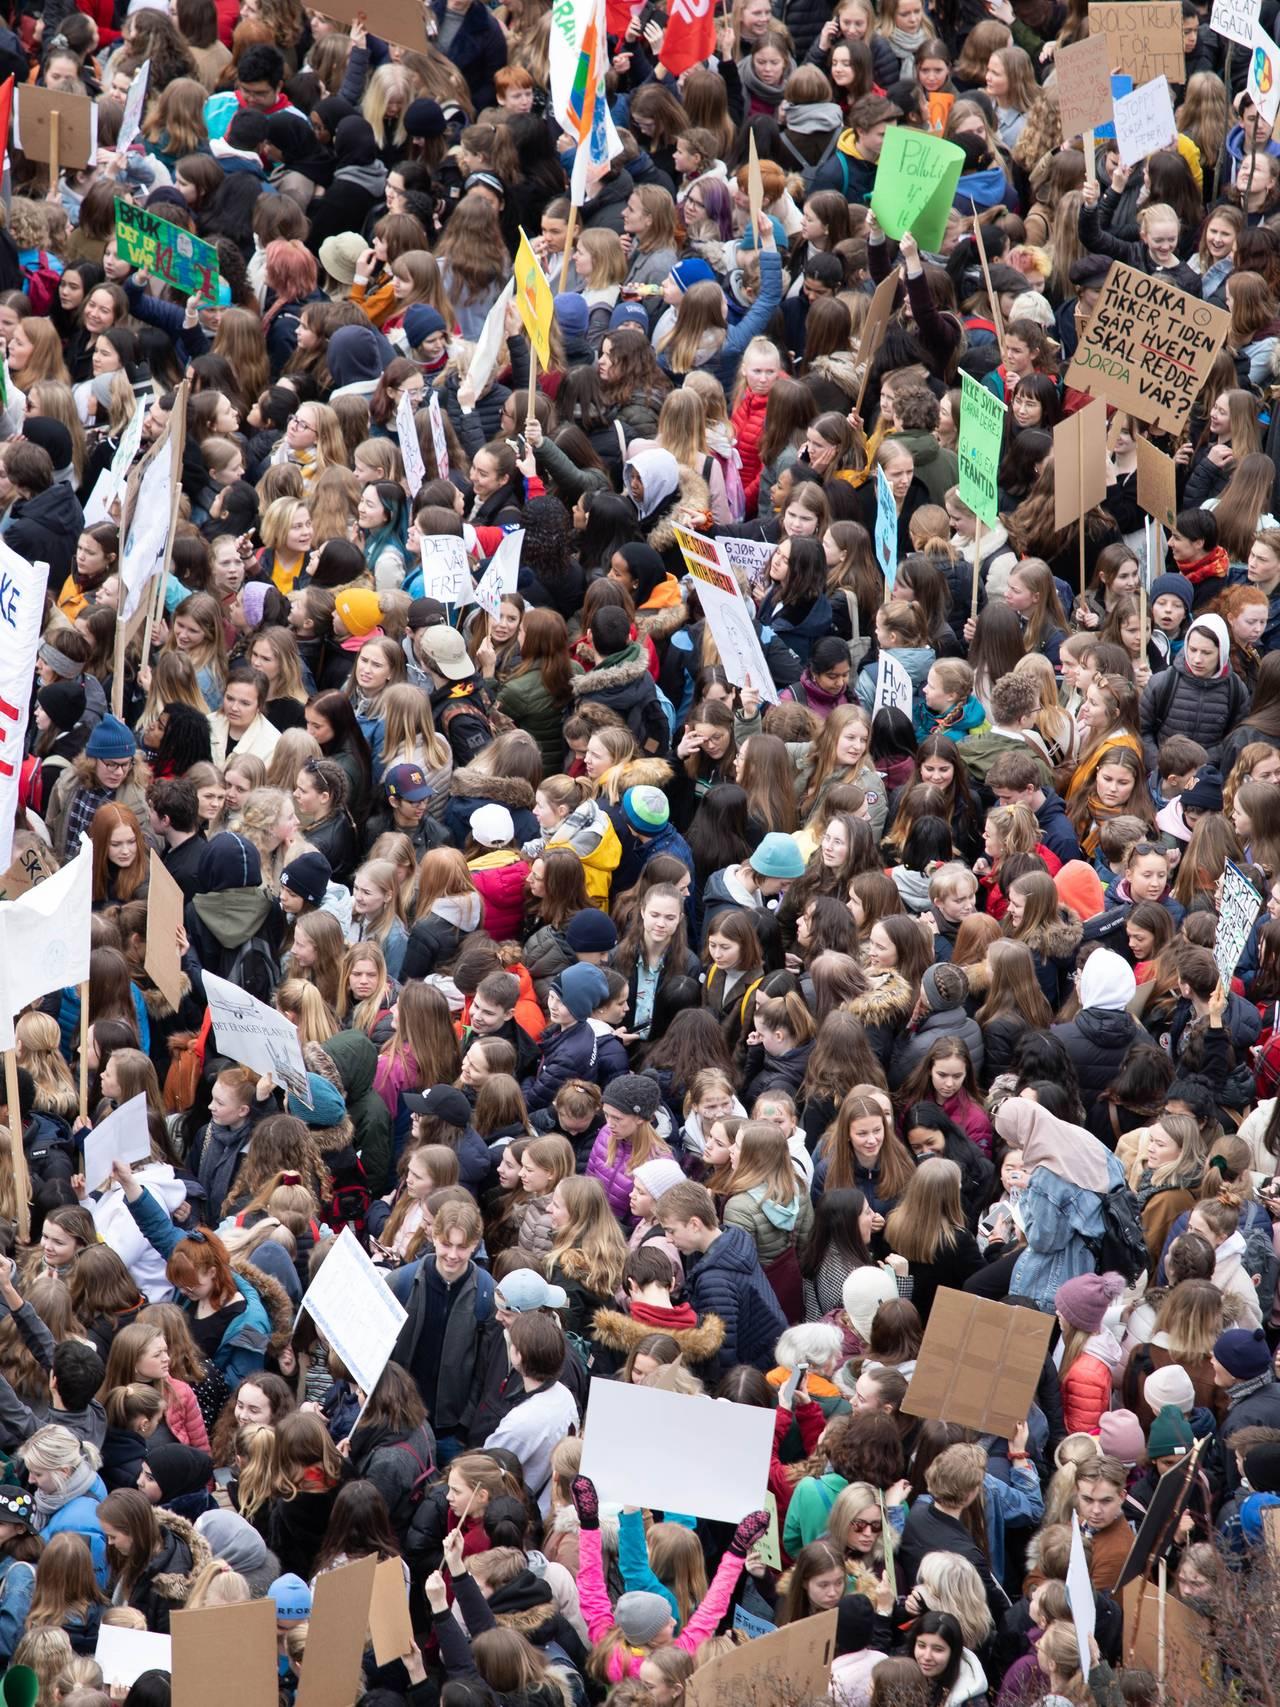 Skoleungdom streiker for klimatiltak på Eidsvolls plass i Oslo.